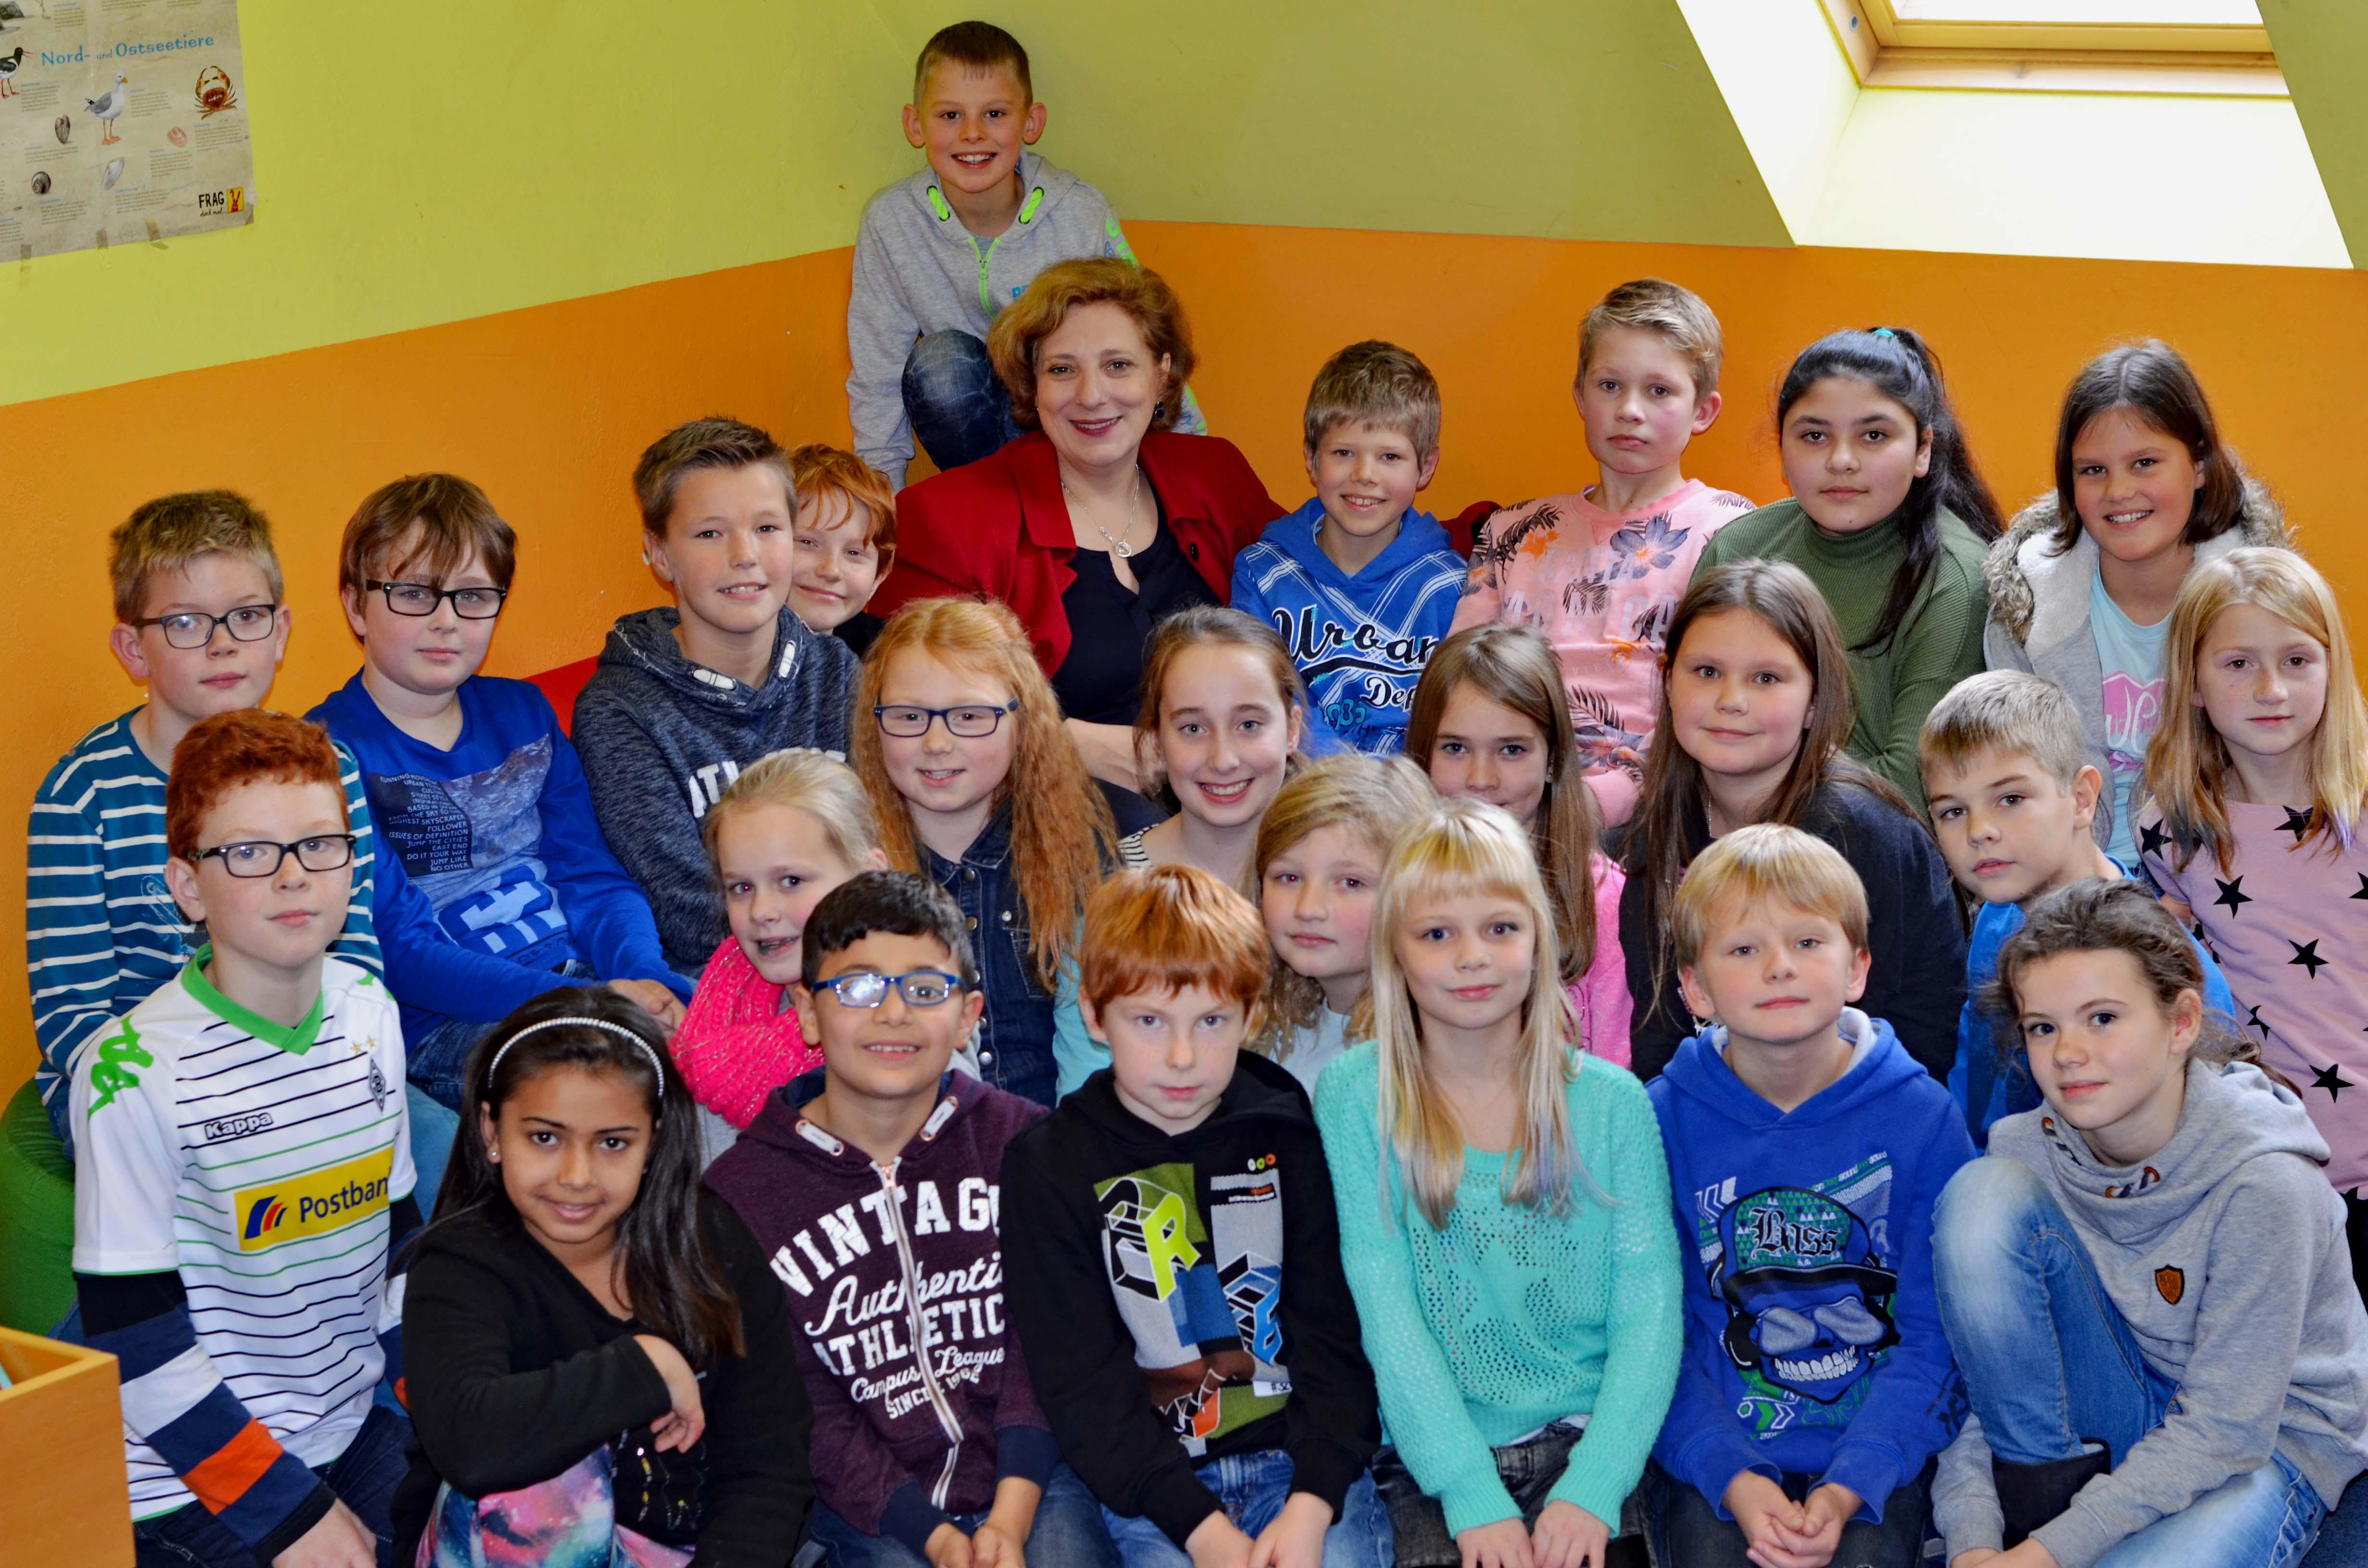 Dr. Daniela De Ridder zu Gast in der Grundschule Uelsen